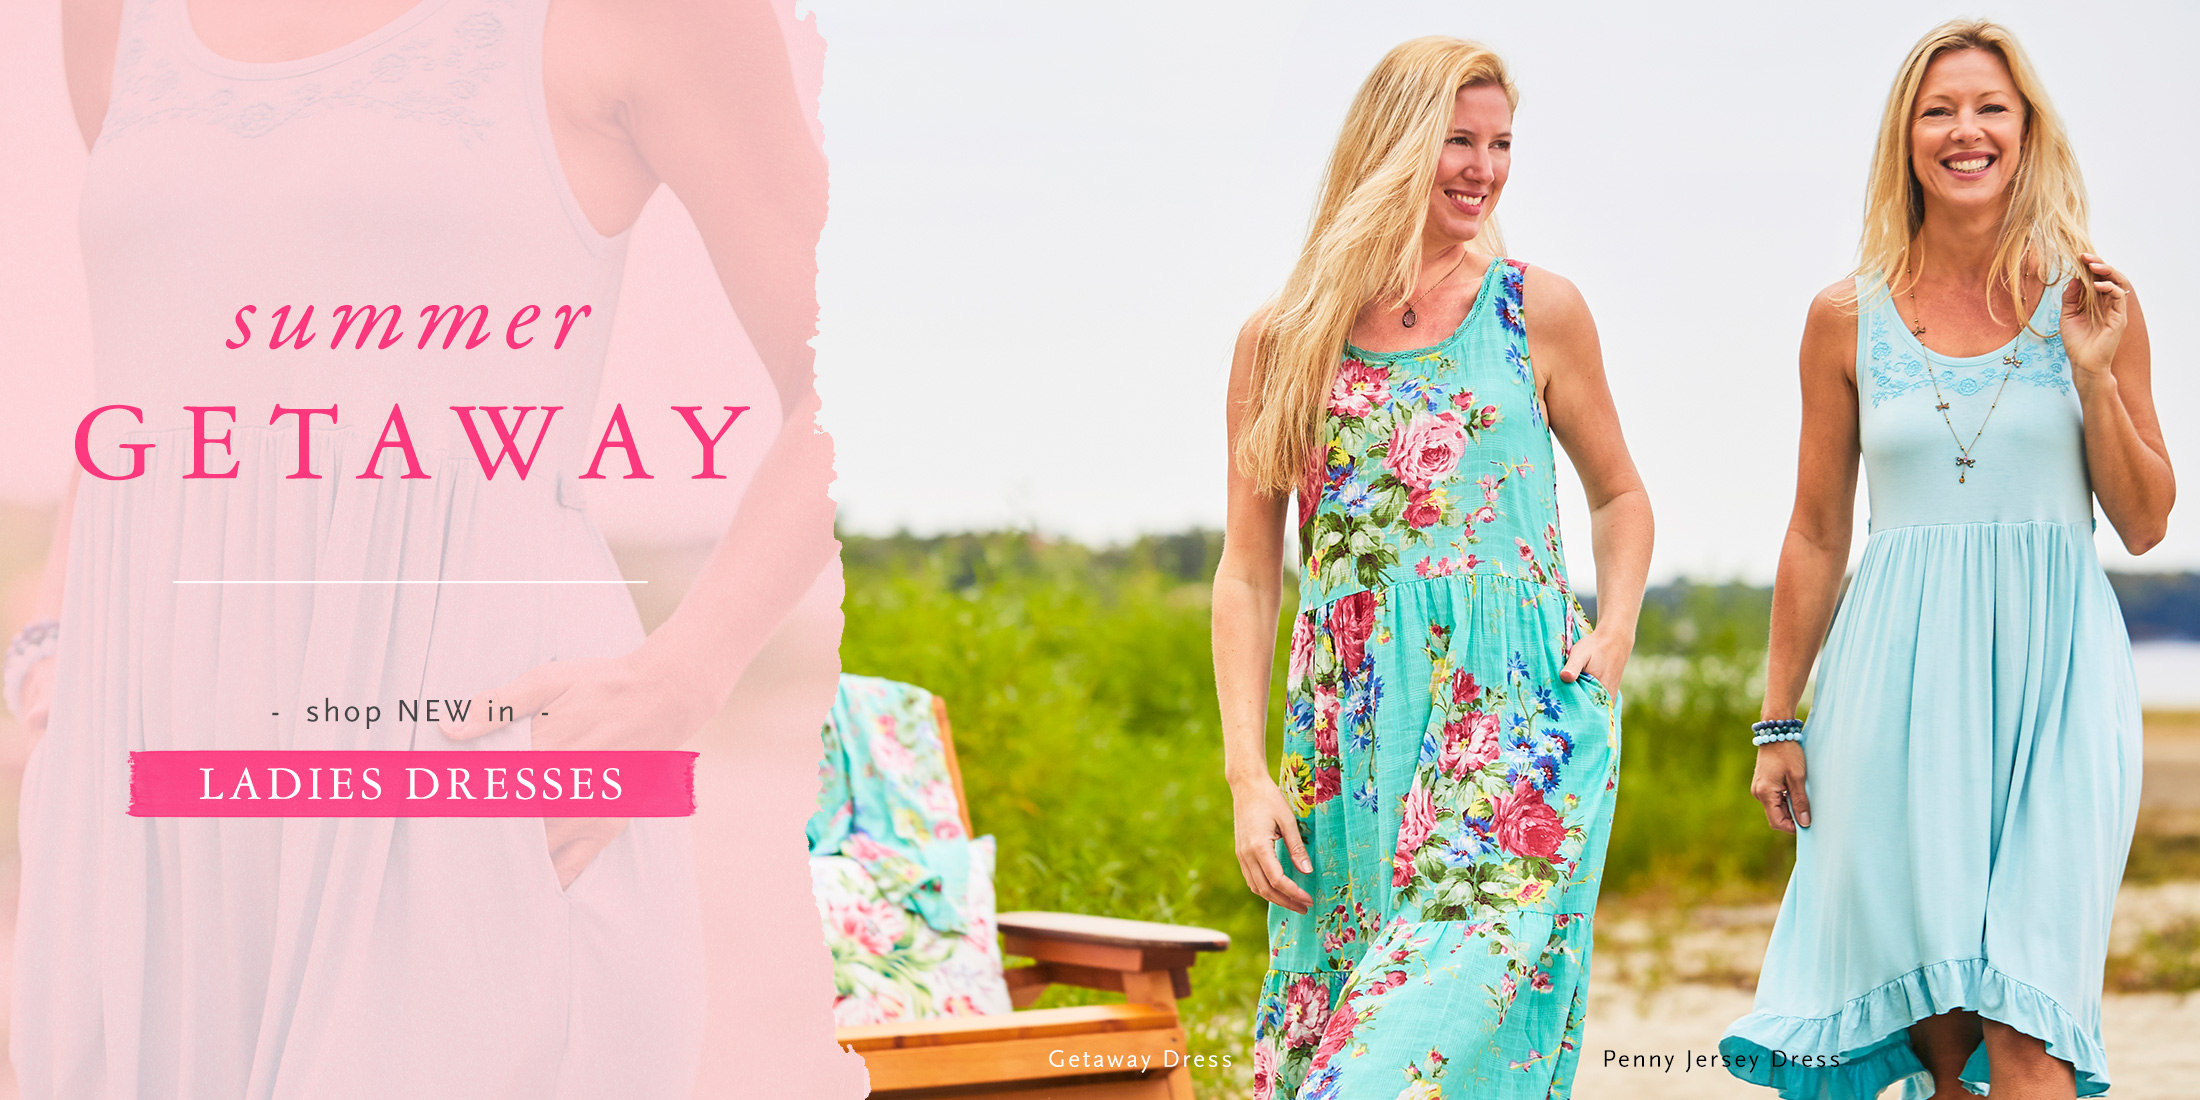 Shop new in Ladies Dresses